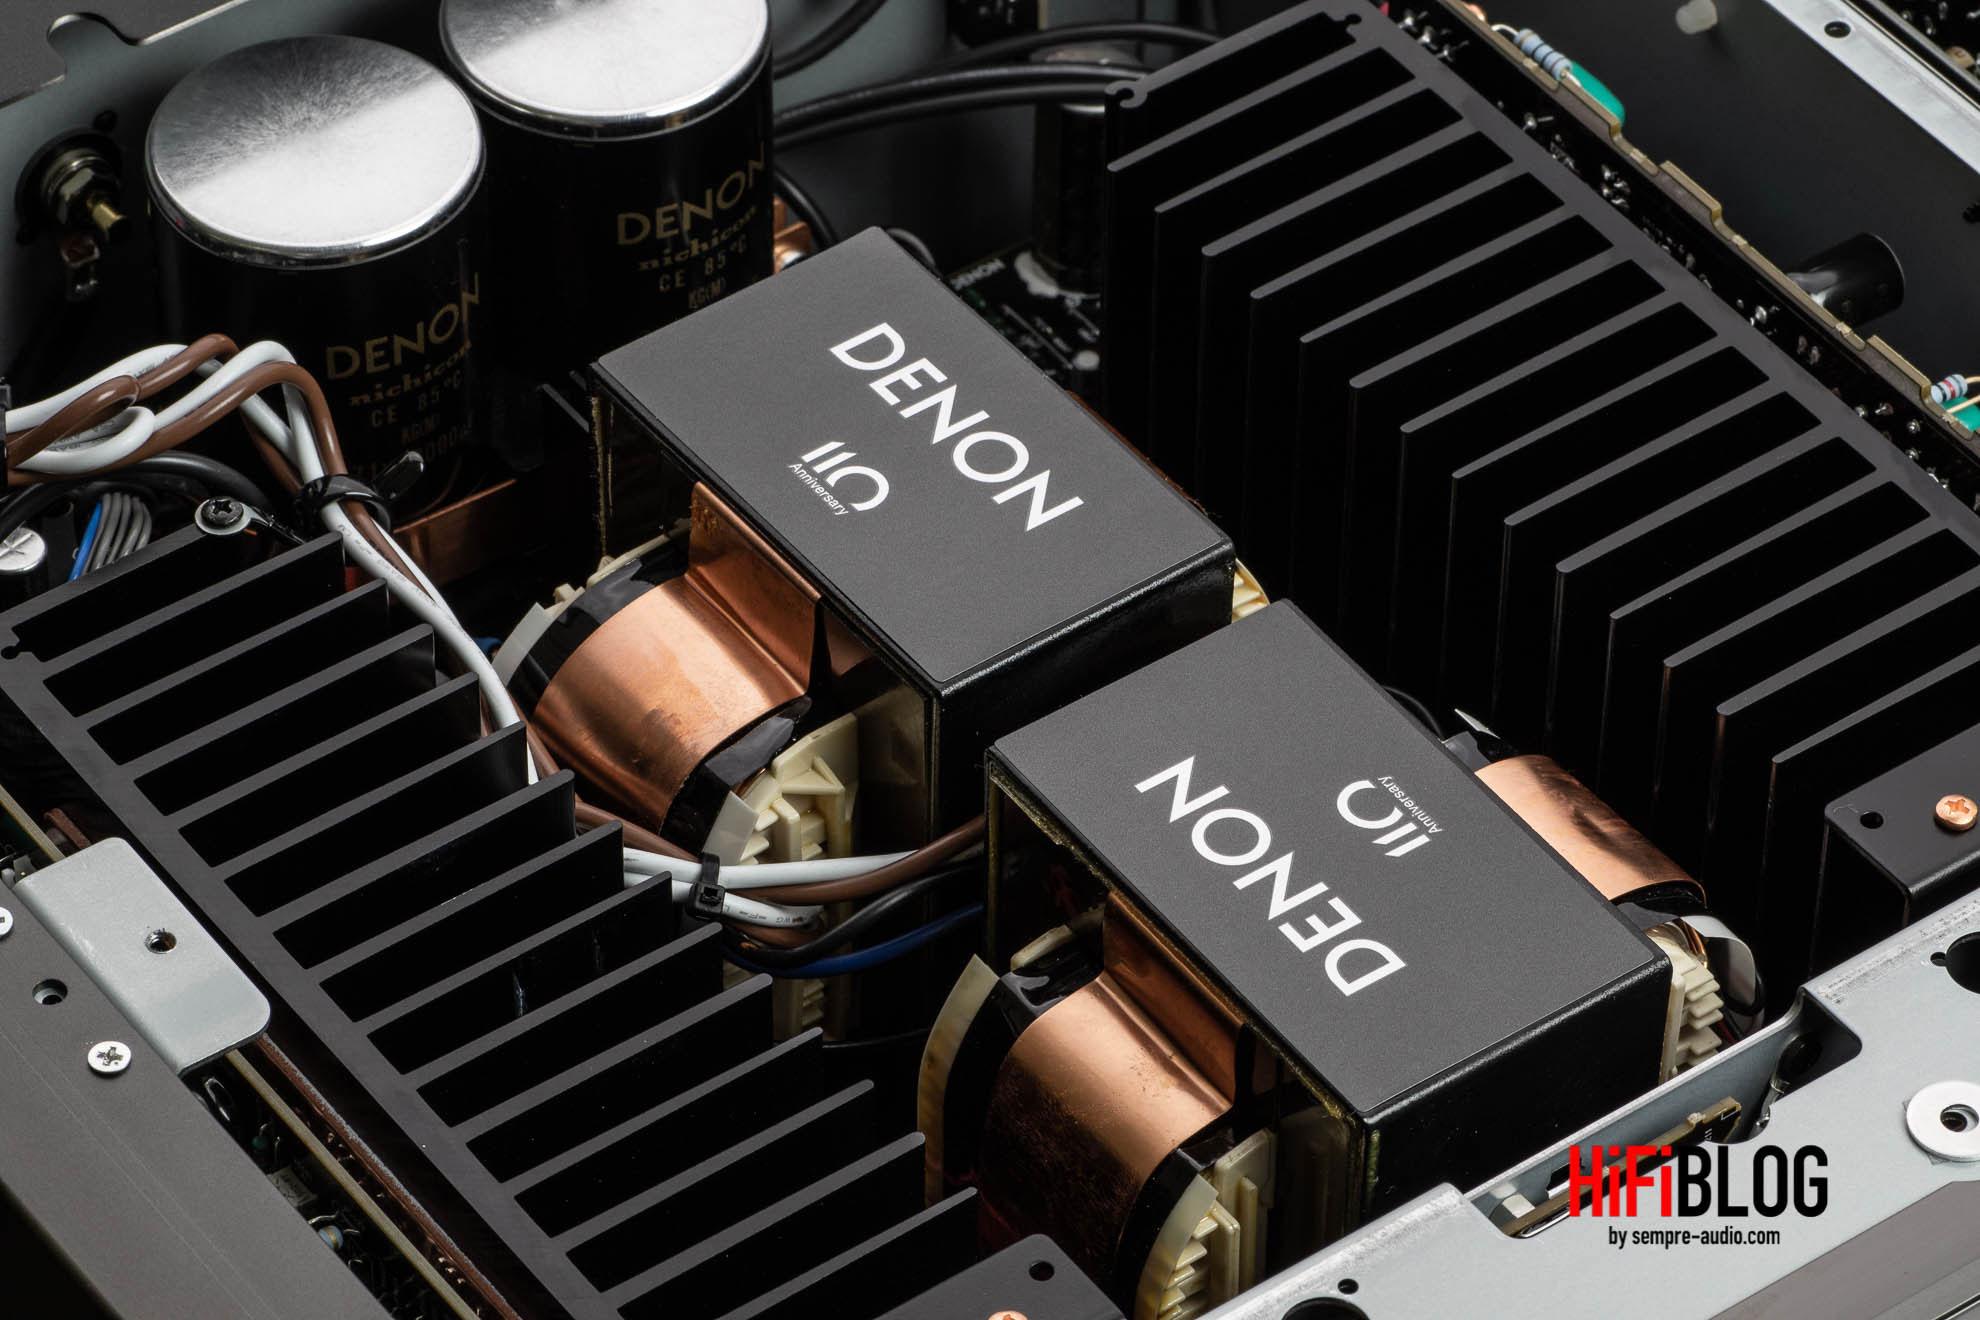 Denon PMA A110 Integrated Amplifier Gallery 12